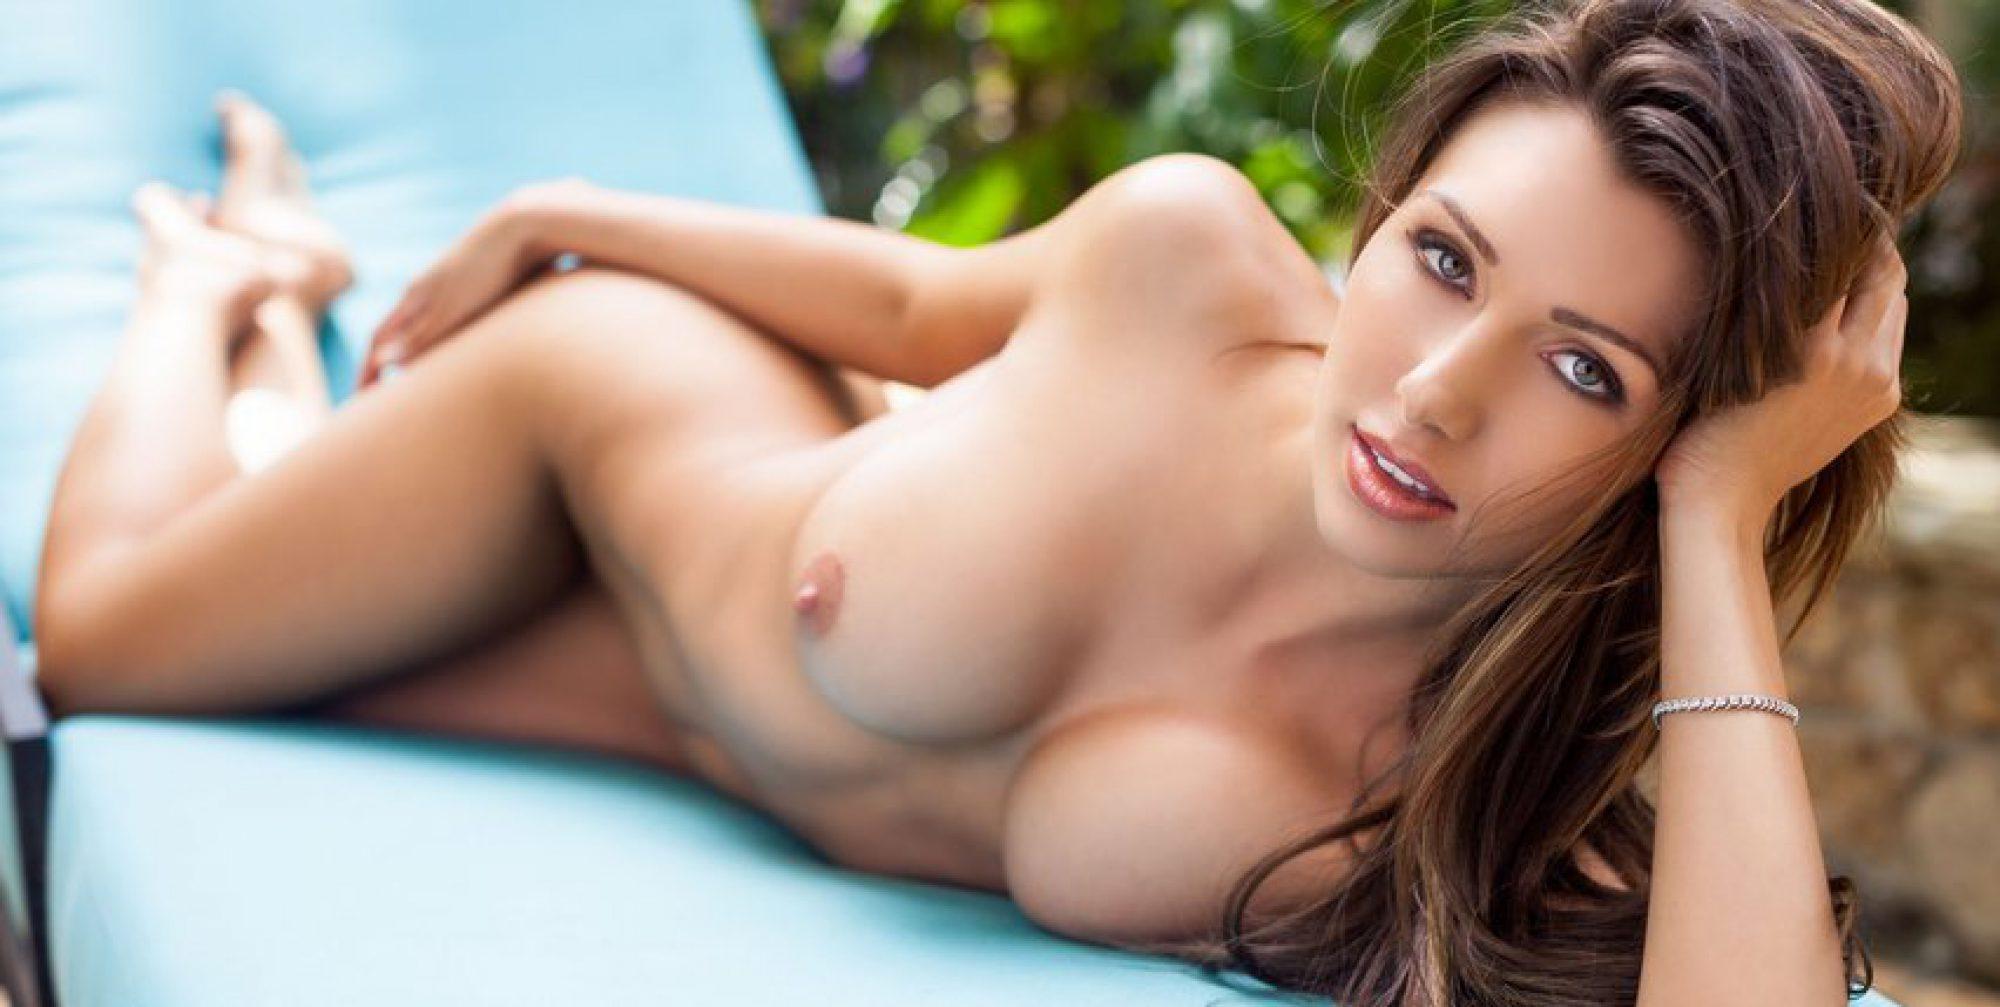 Фото девушки голая